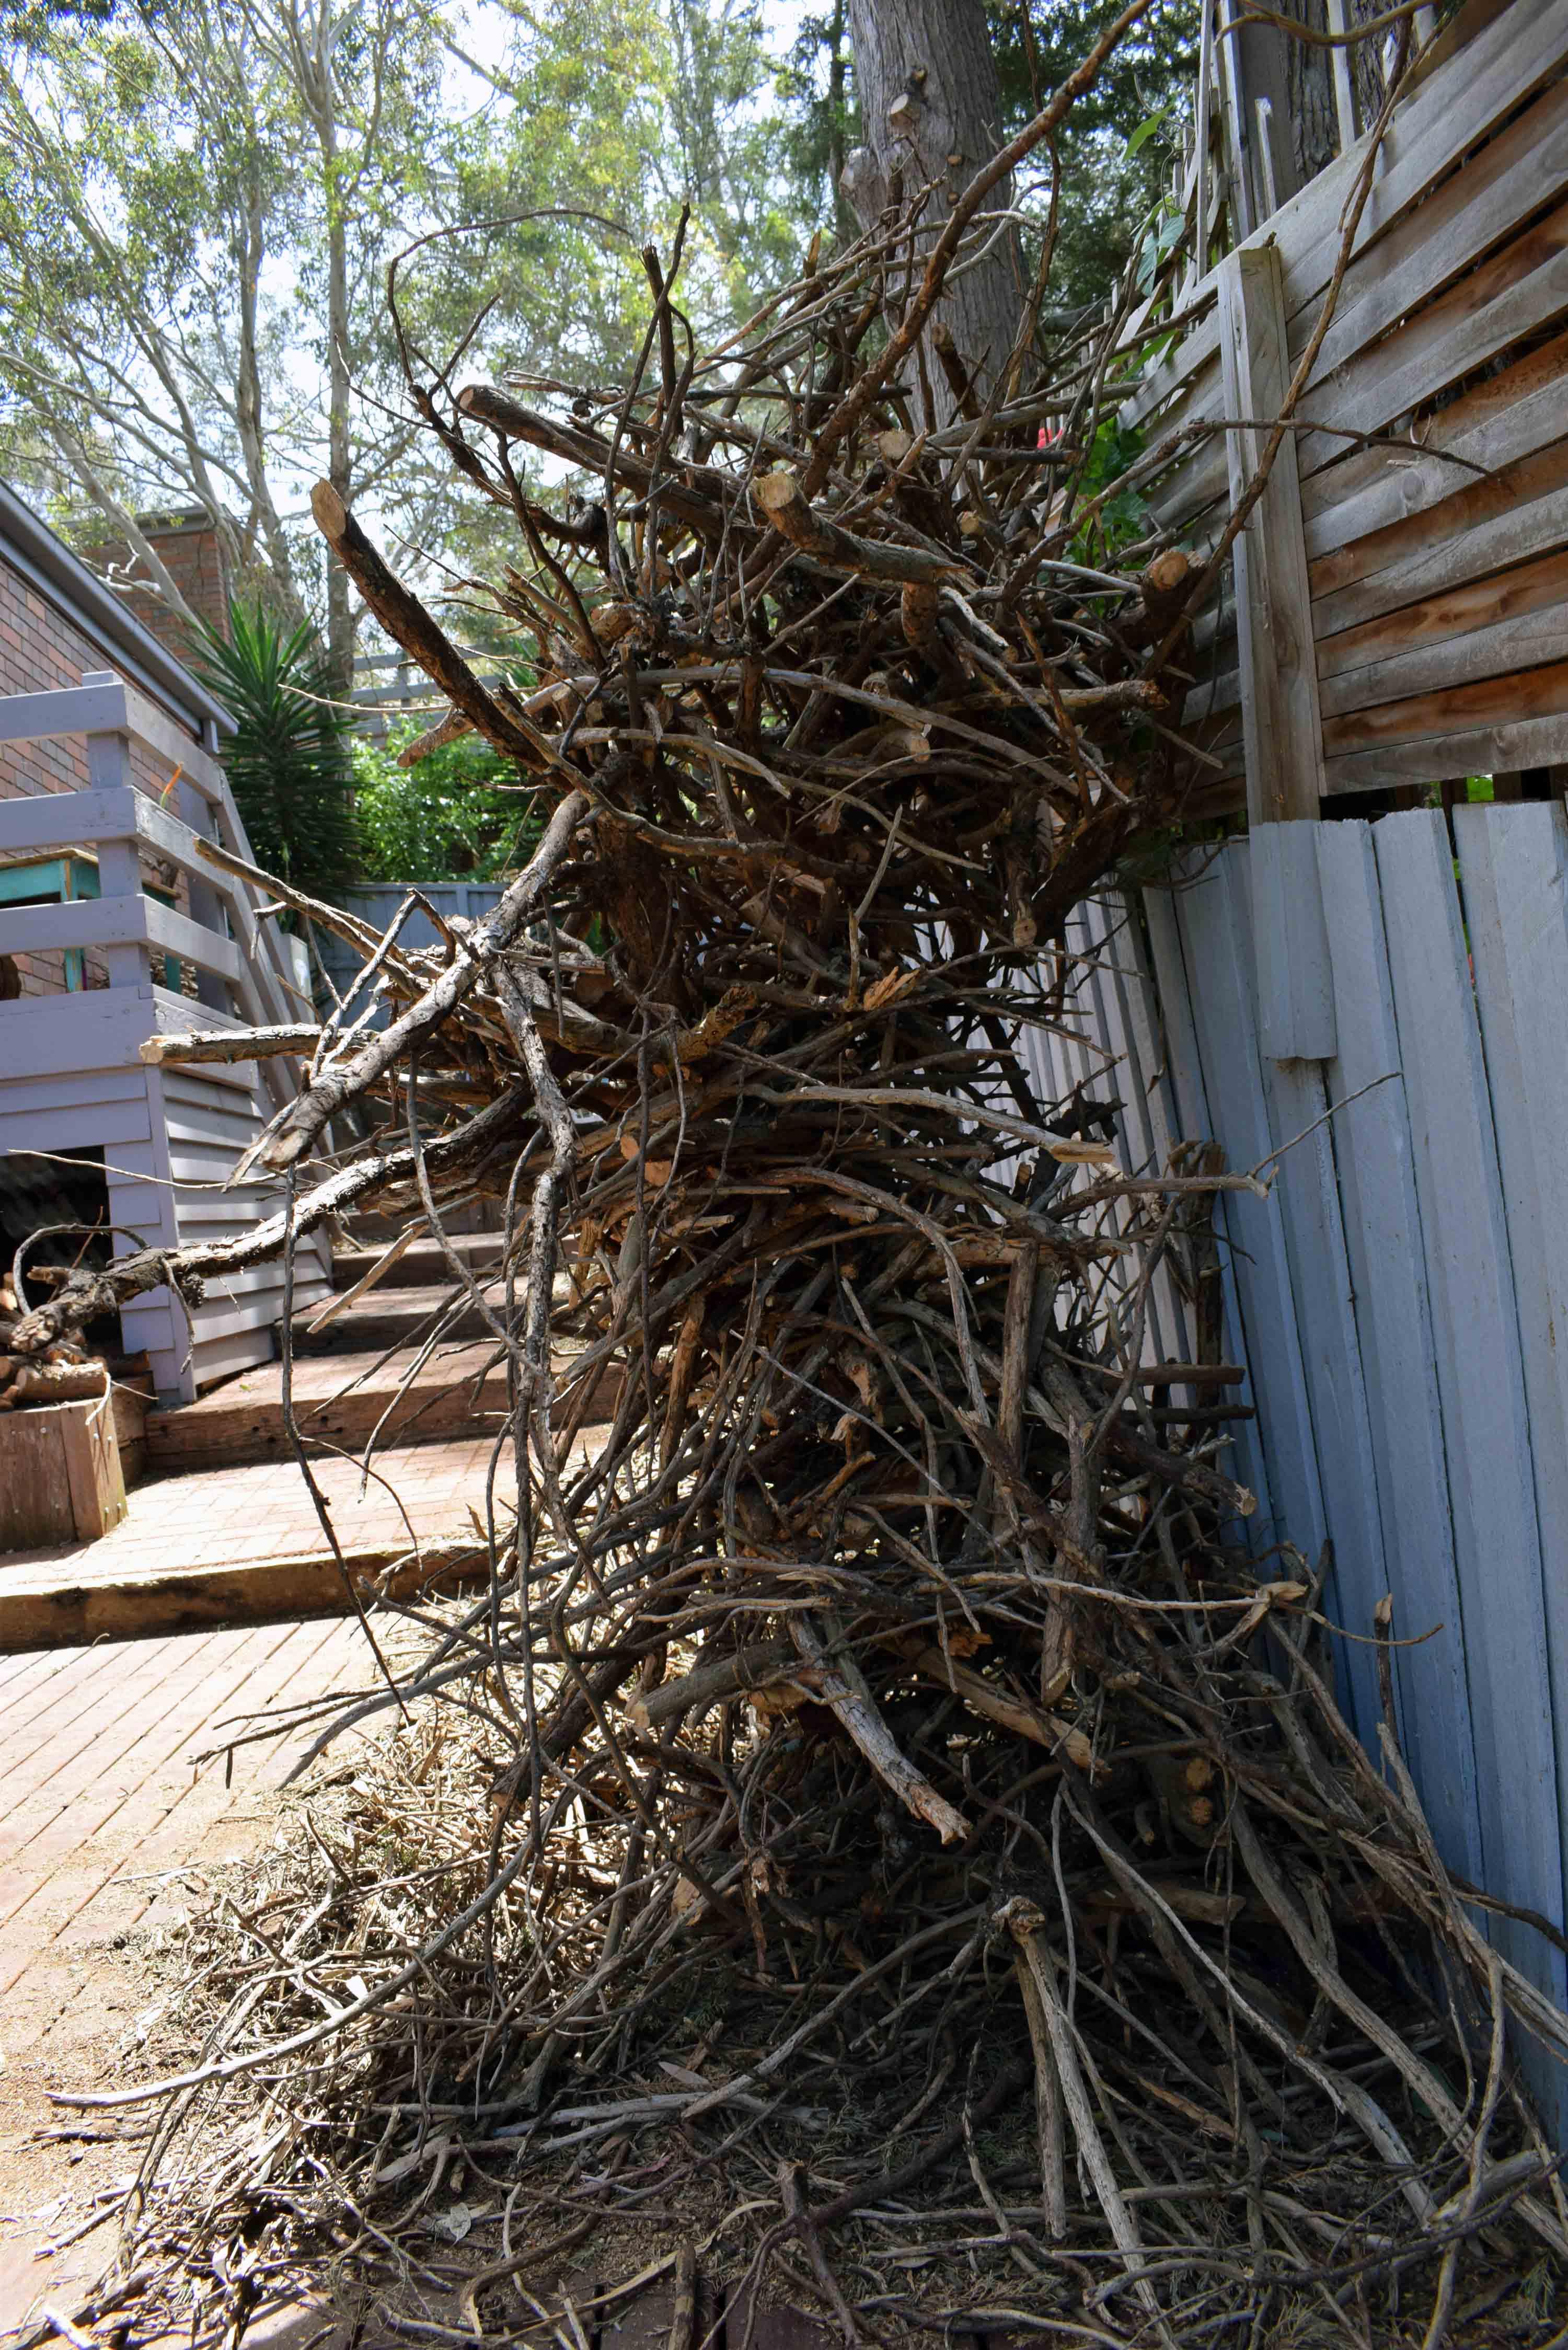 Piles of Sticks